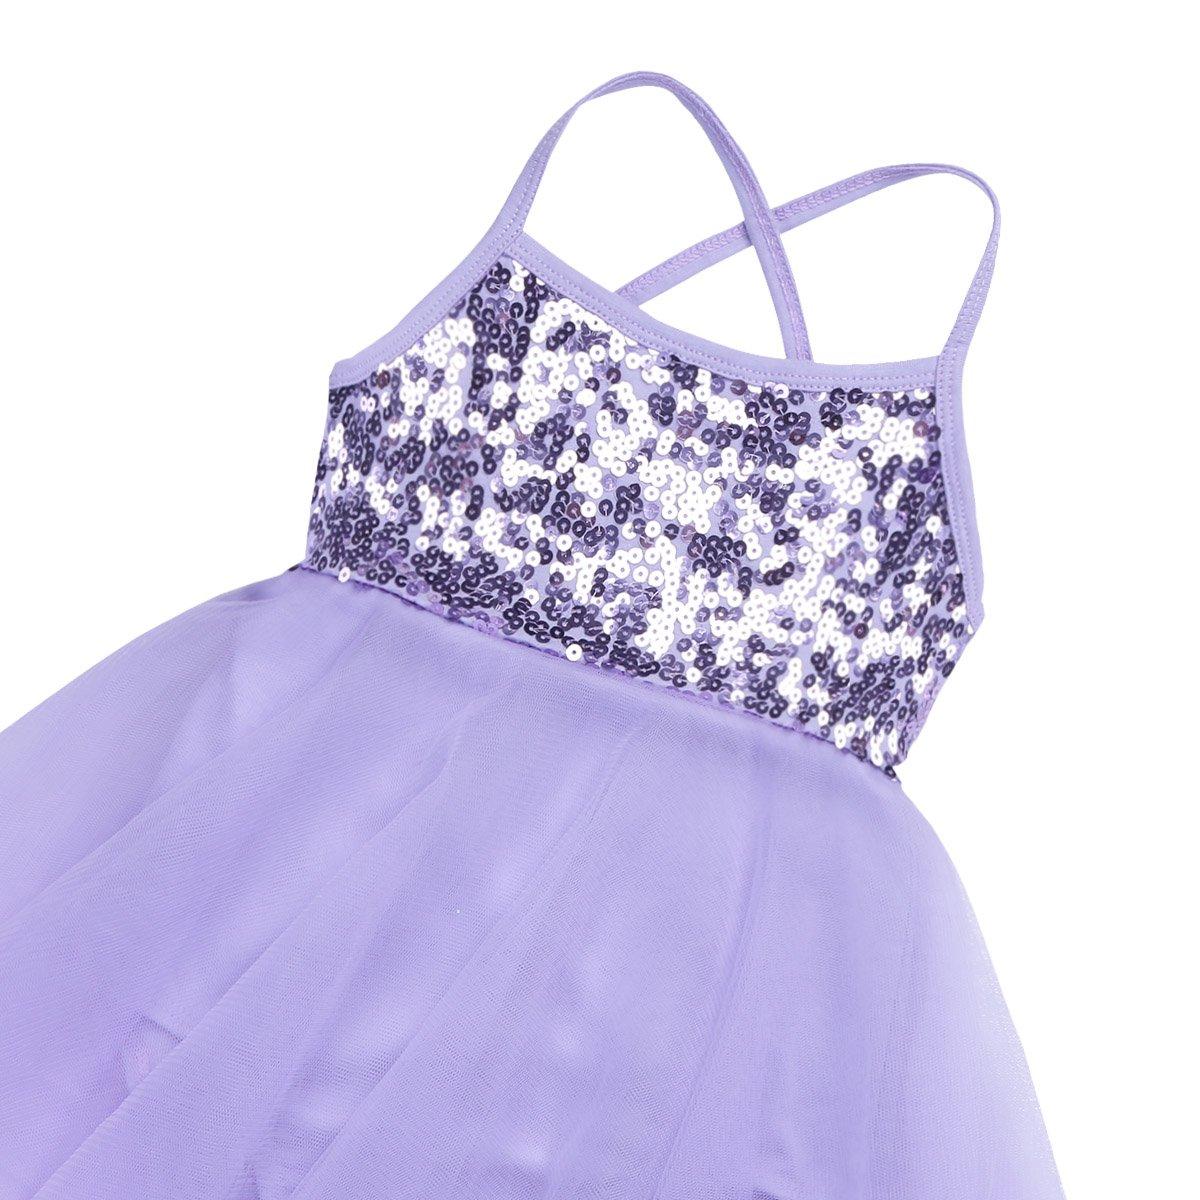 CHICTRY Girls Children Shiny Sequined Ballet Skirted Dance Leotard Dress Fancy Party Costume